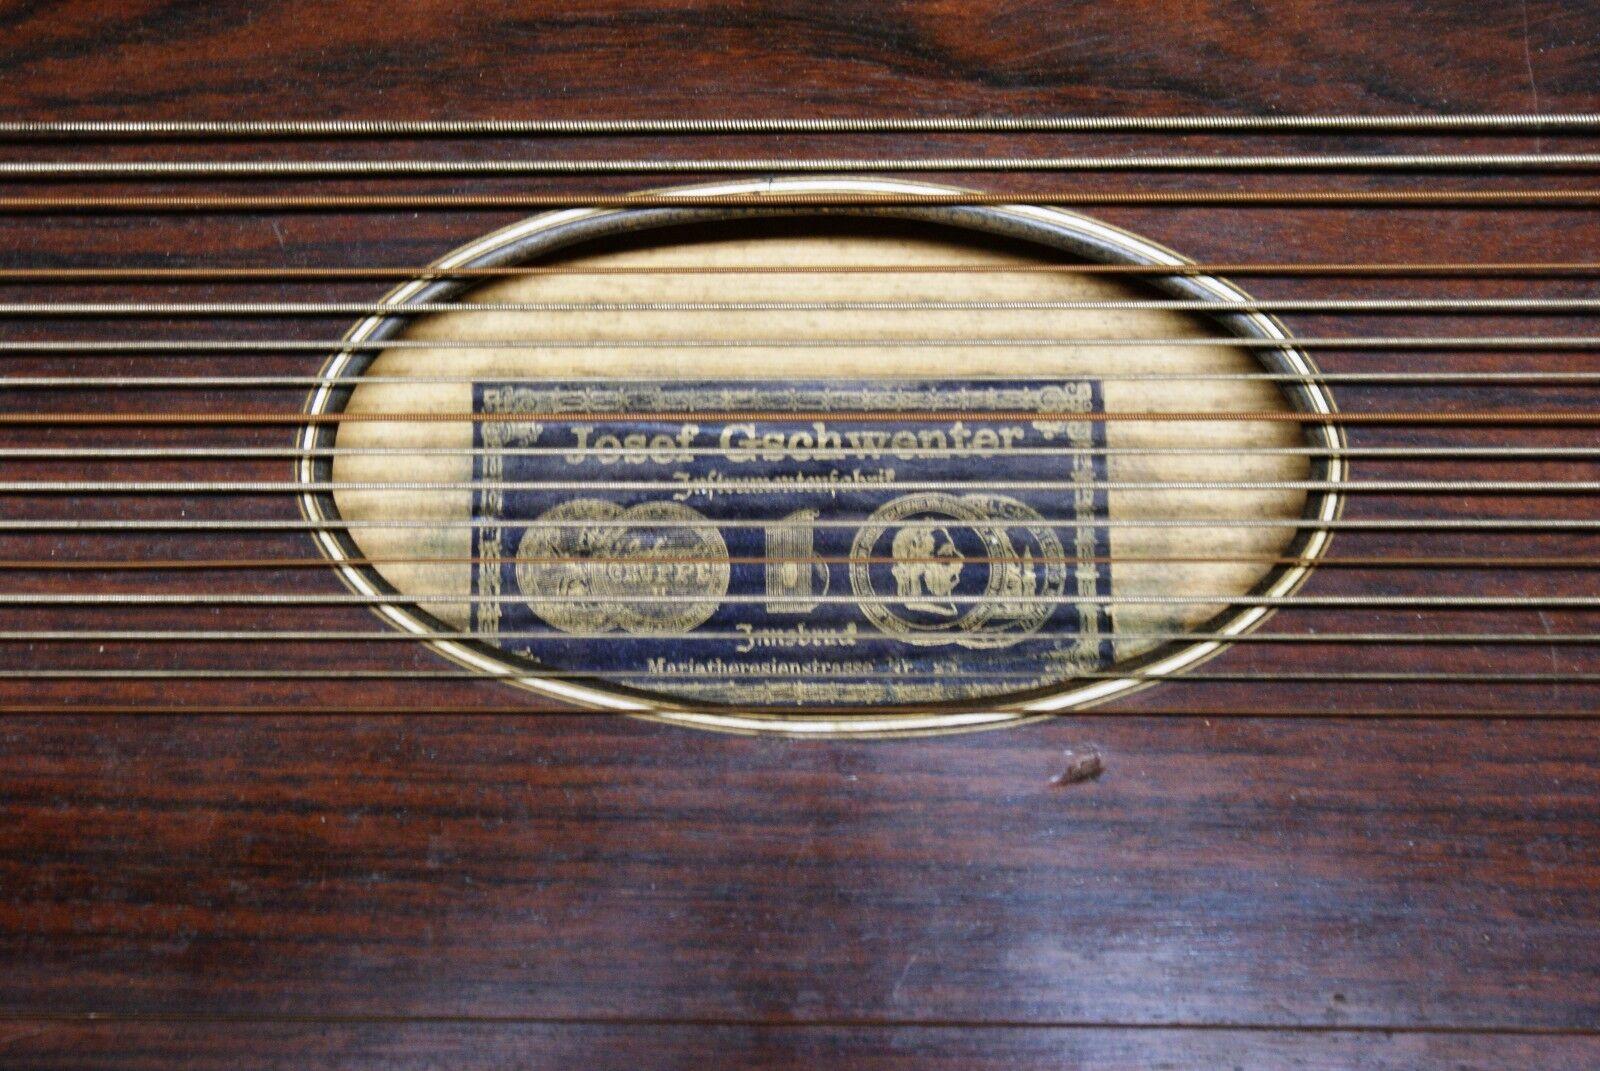 Antico strumento a a a corda + custodia fc27df